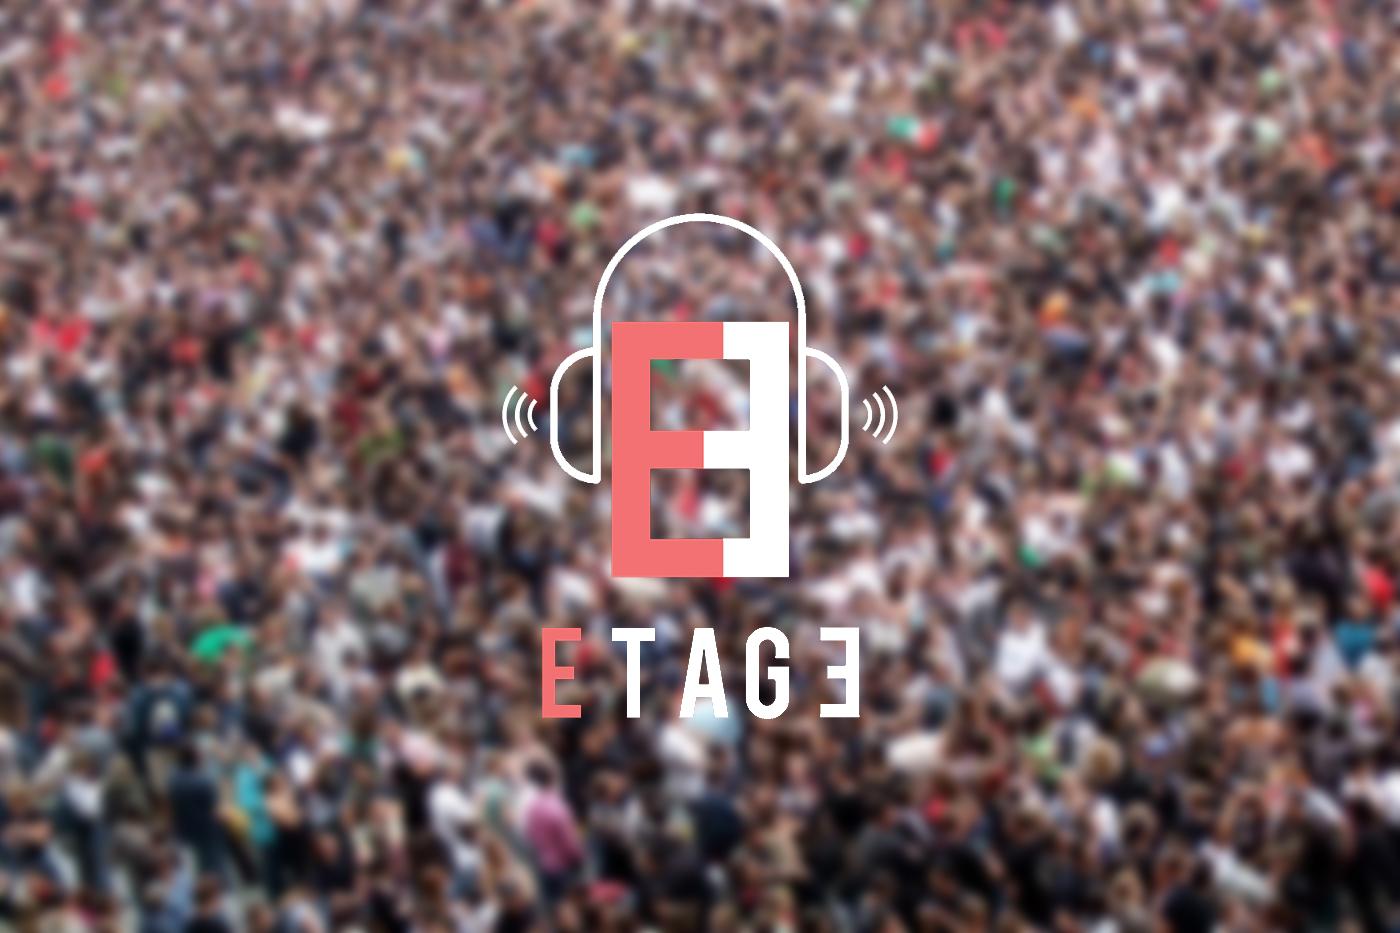 Podcast pop